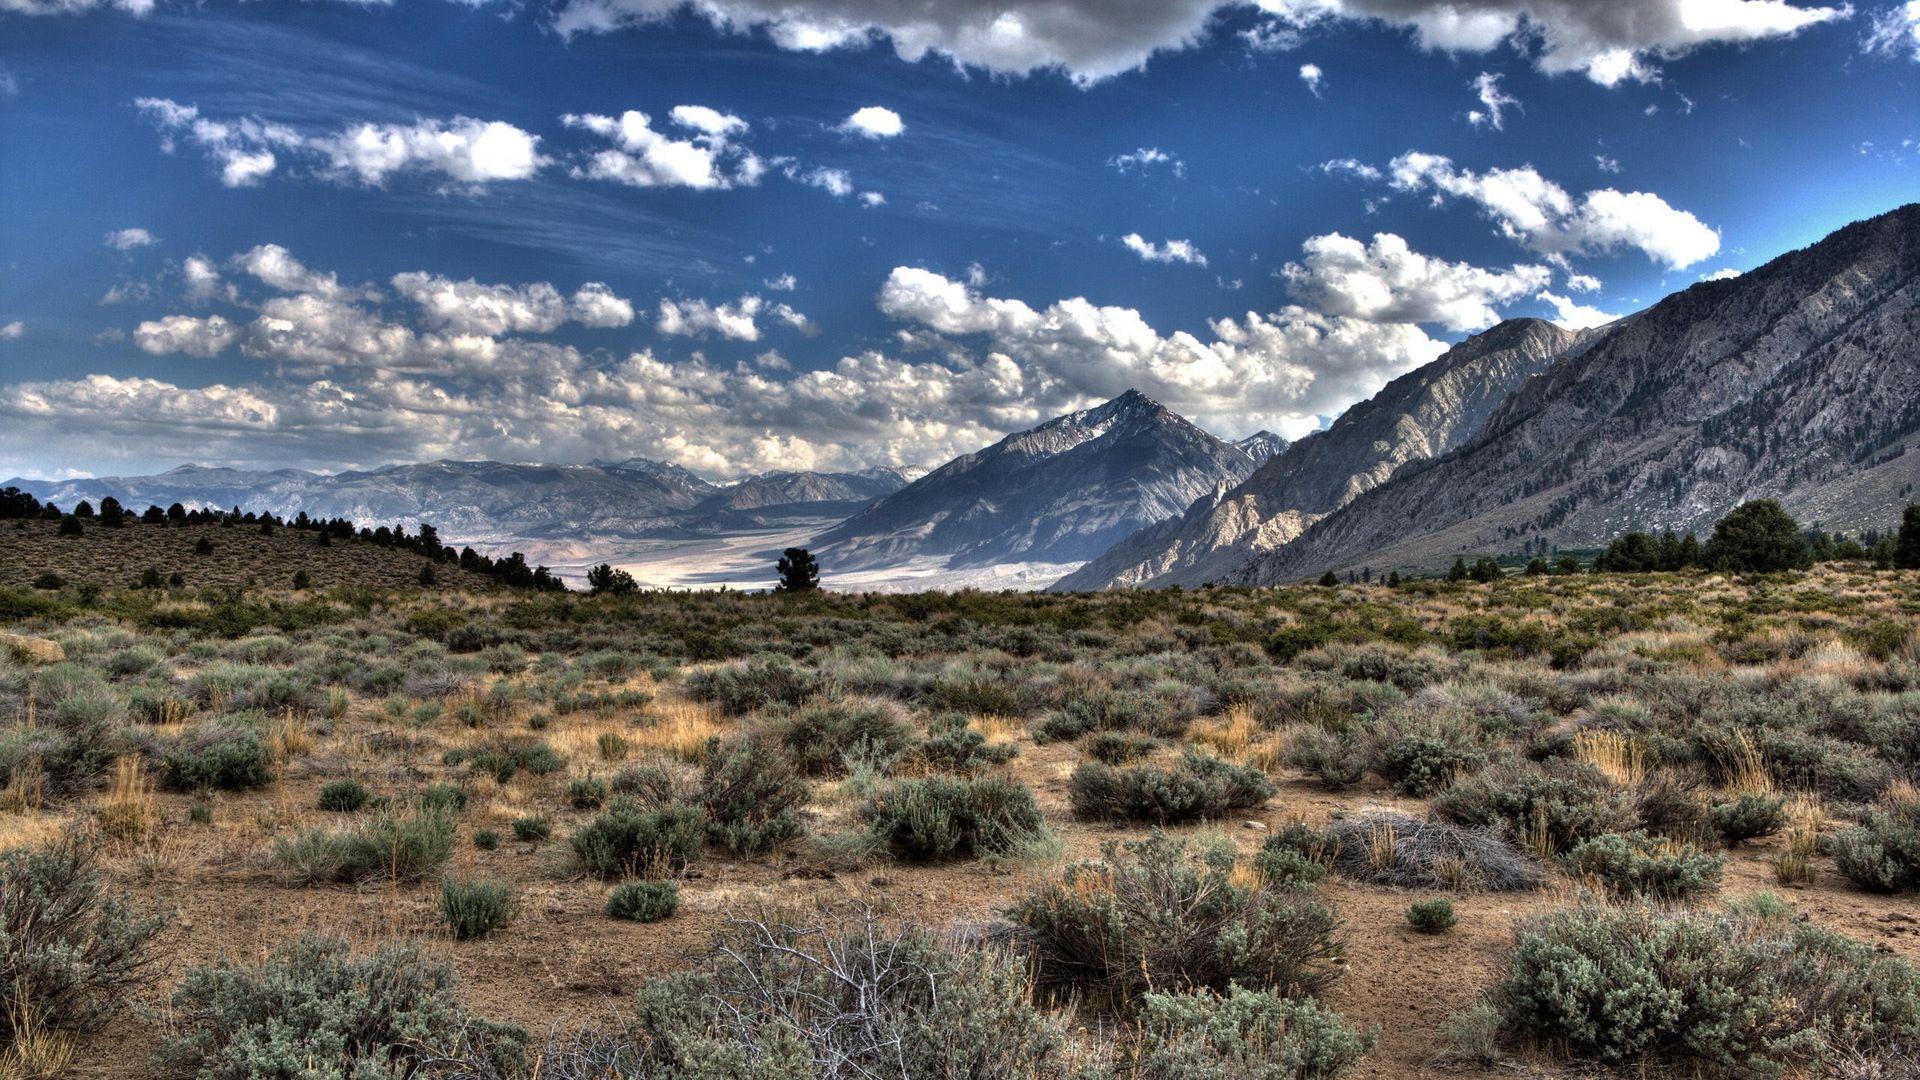 Desert Foothills Landscape nice wallpaper